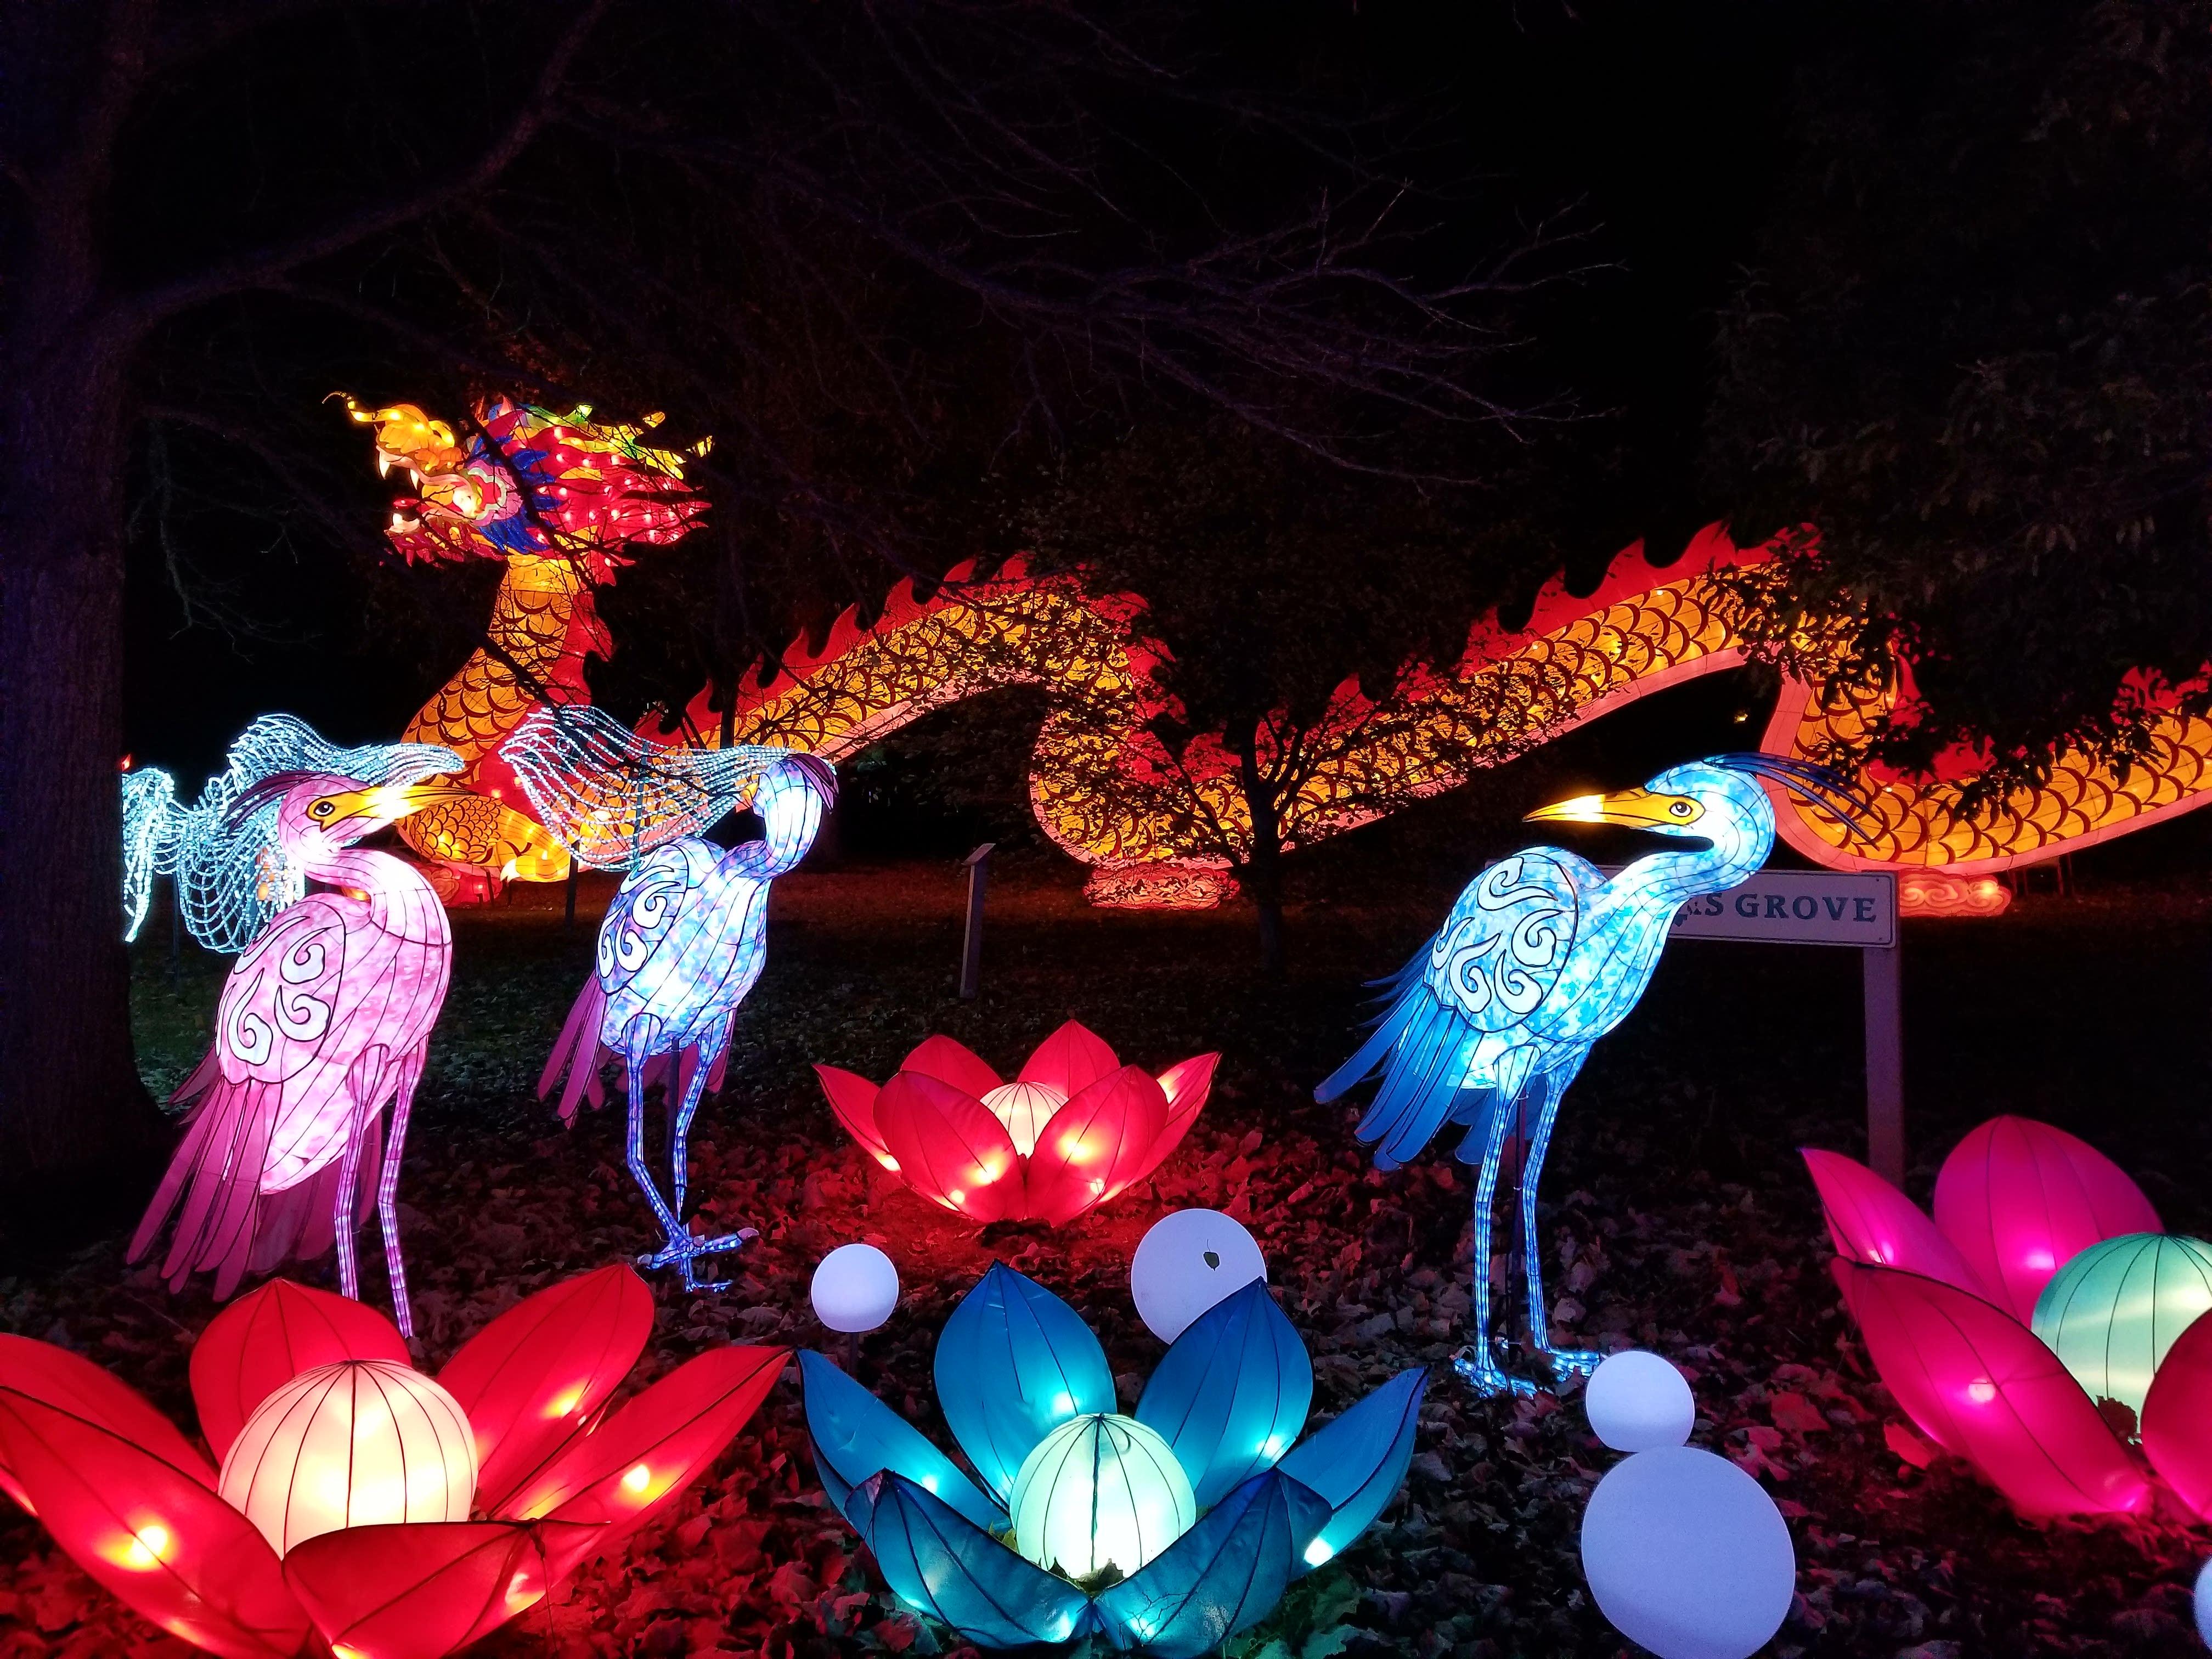 Best Christmas Lights Displays In Ohio Ohio Girl Travels